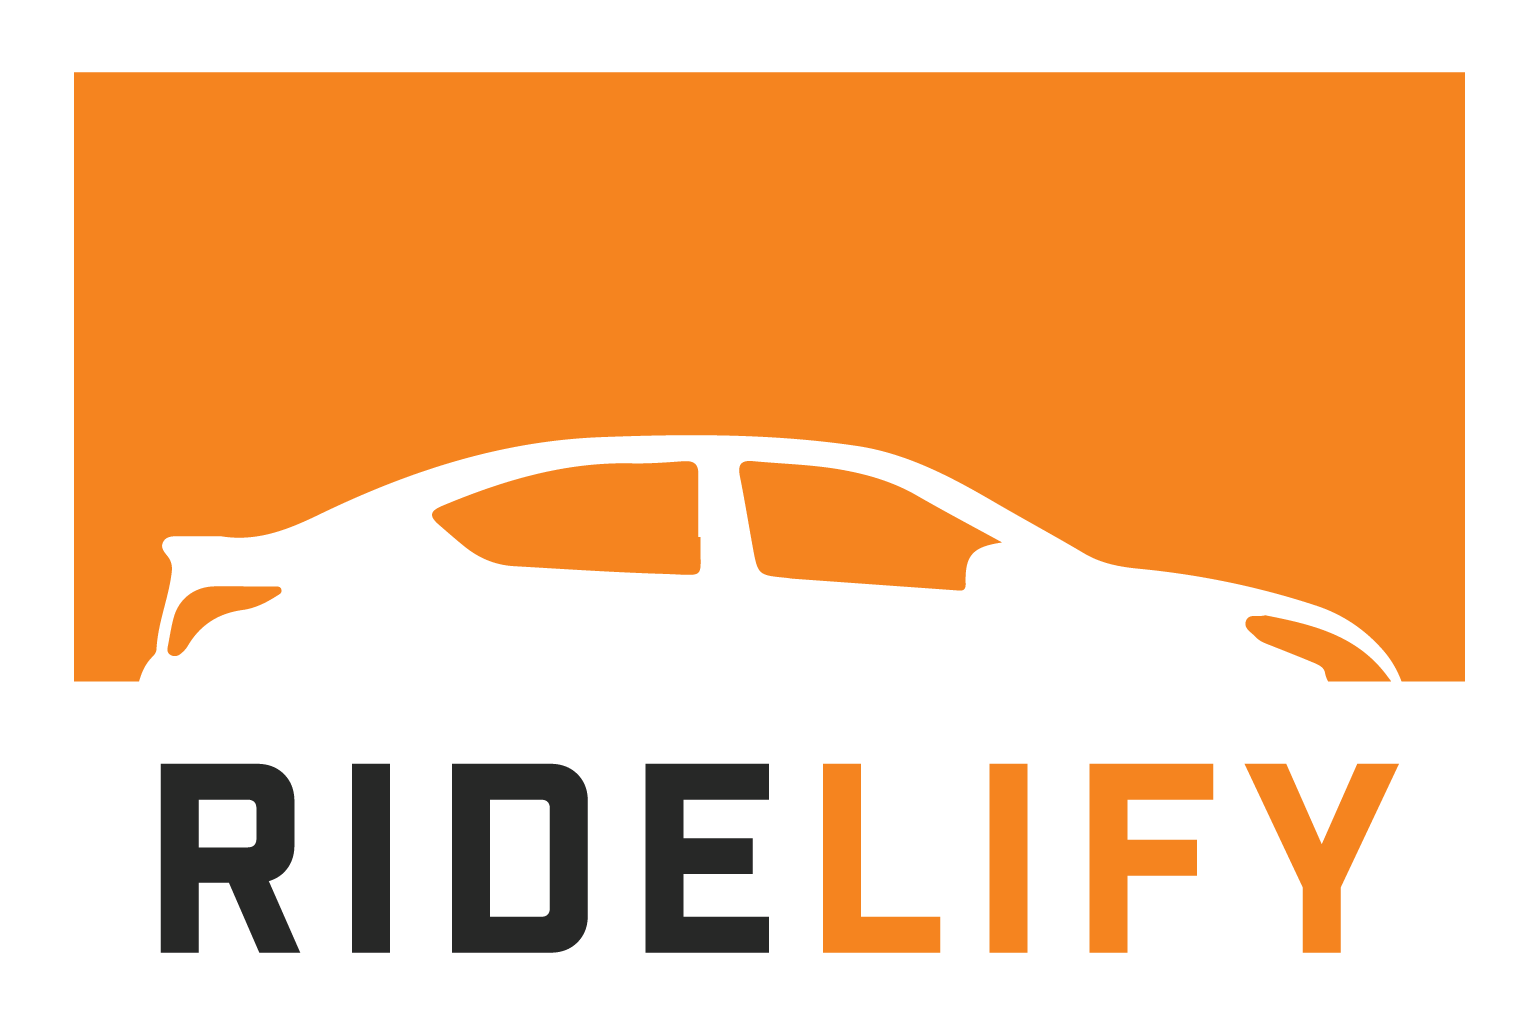 Ridelify